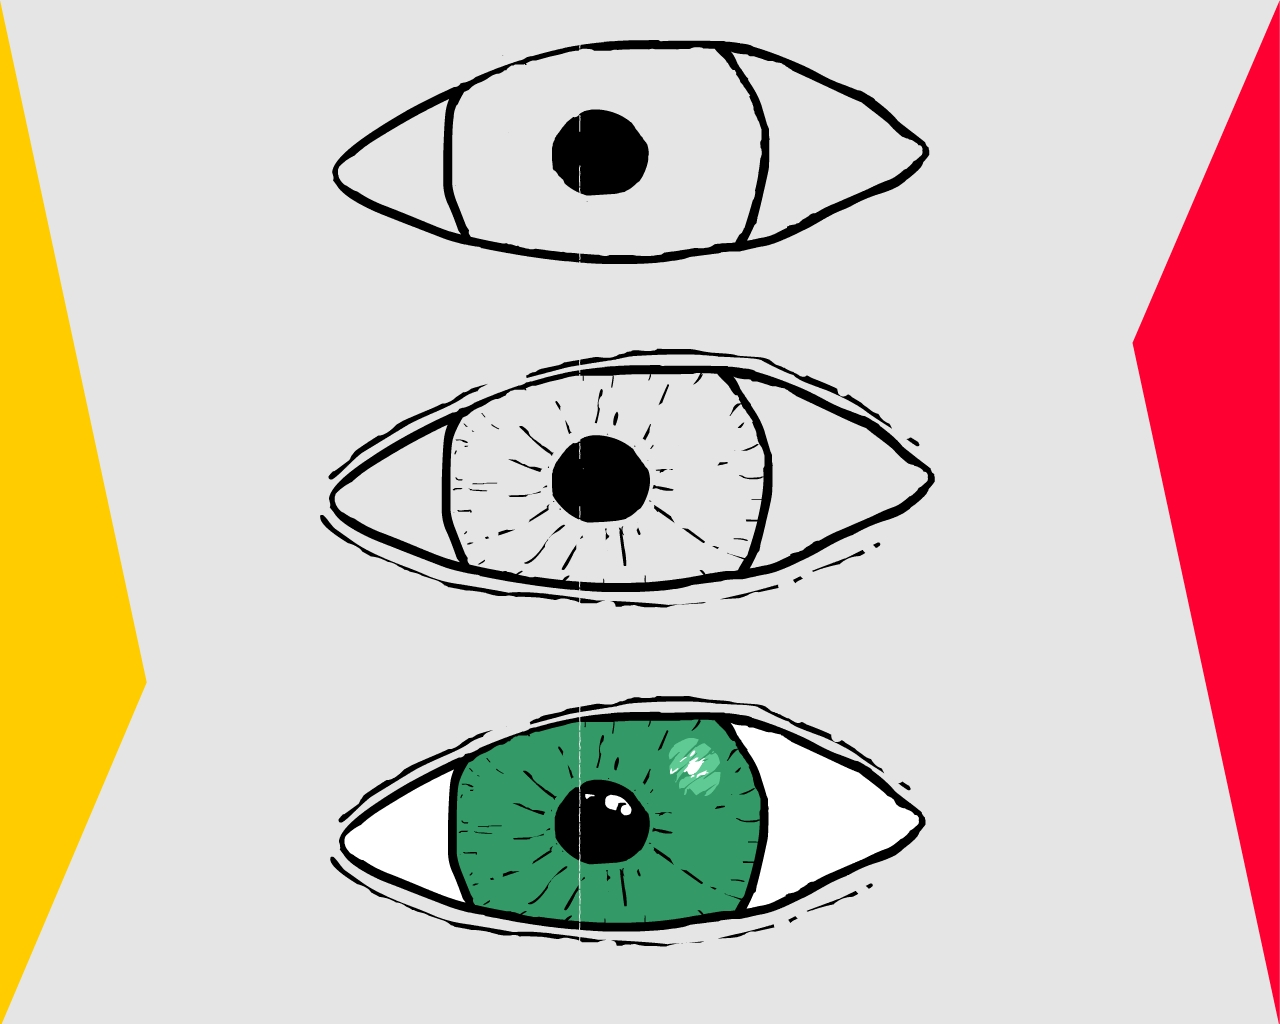 why an eye ?